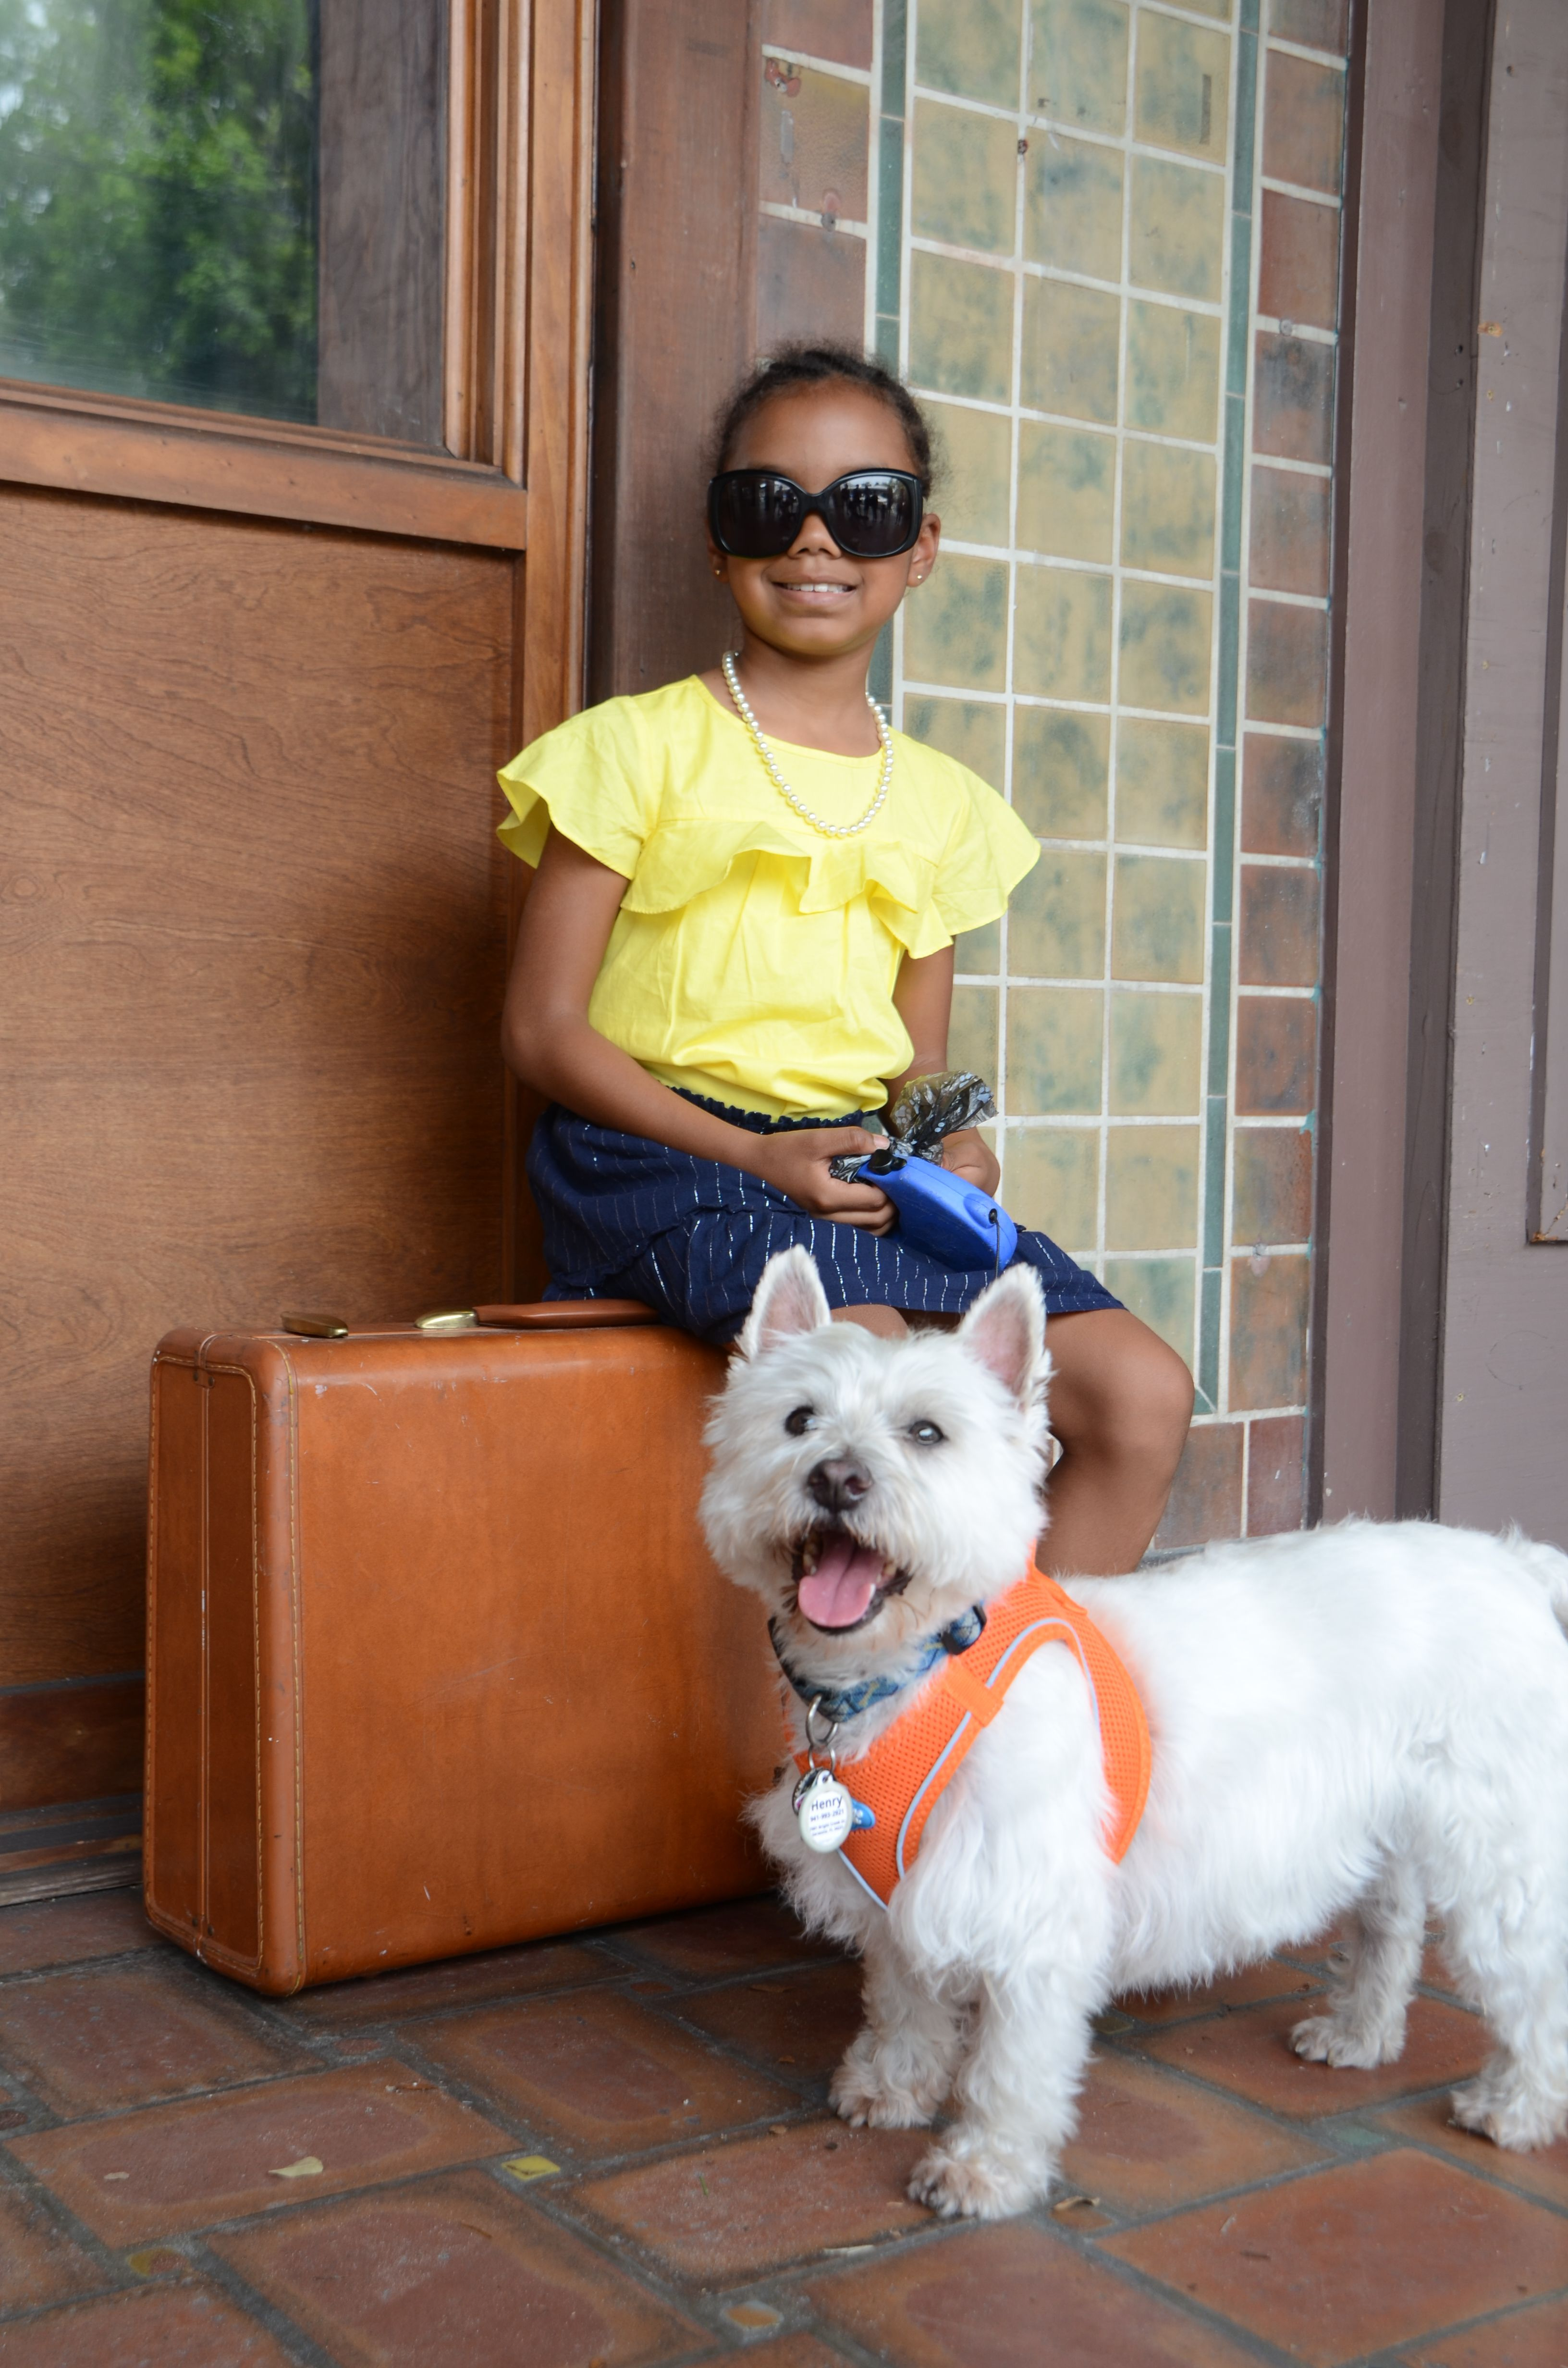 ff0a632c29931 Top  Carter s Skirt  GAP Shoes  Nine West Glasses  Chanel Dog Companion   Mr. Henry Owner-Patricia Zewatsky